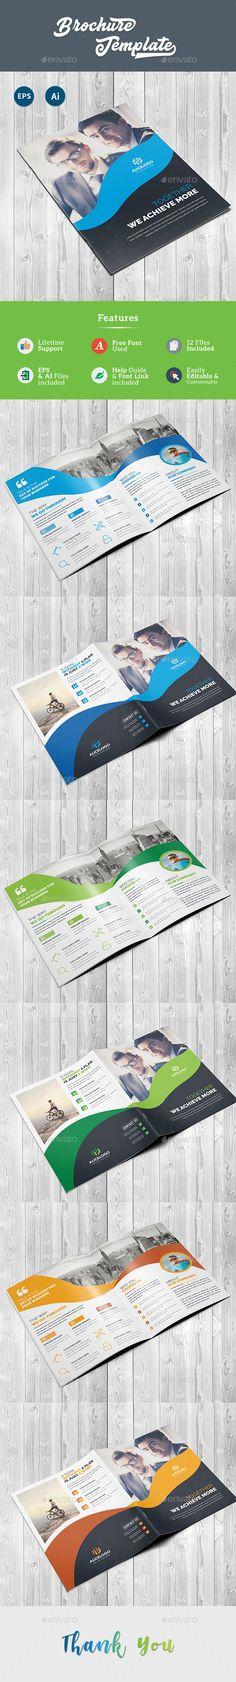 Brochure Design Template Vector EPS, AI Illustrator. Download here: https://graphicriver.net/item/brochure/22090846?ref=ksioks